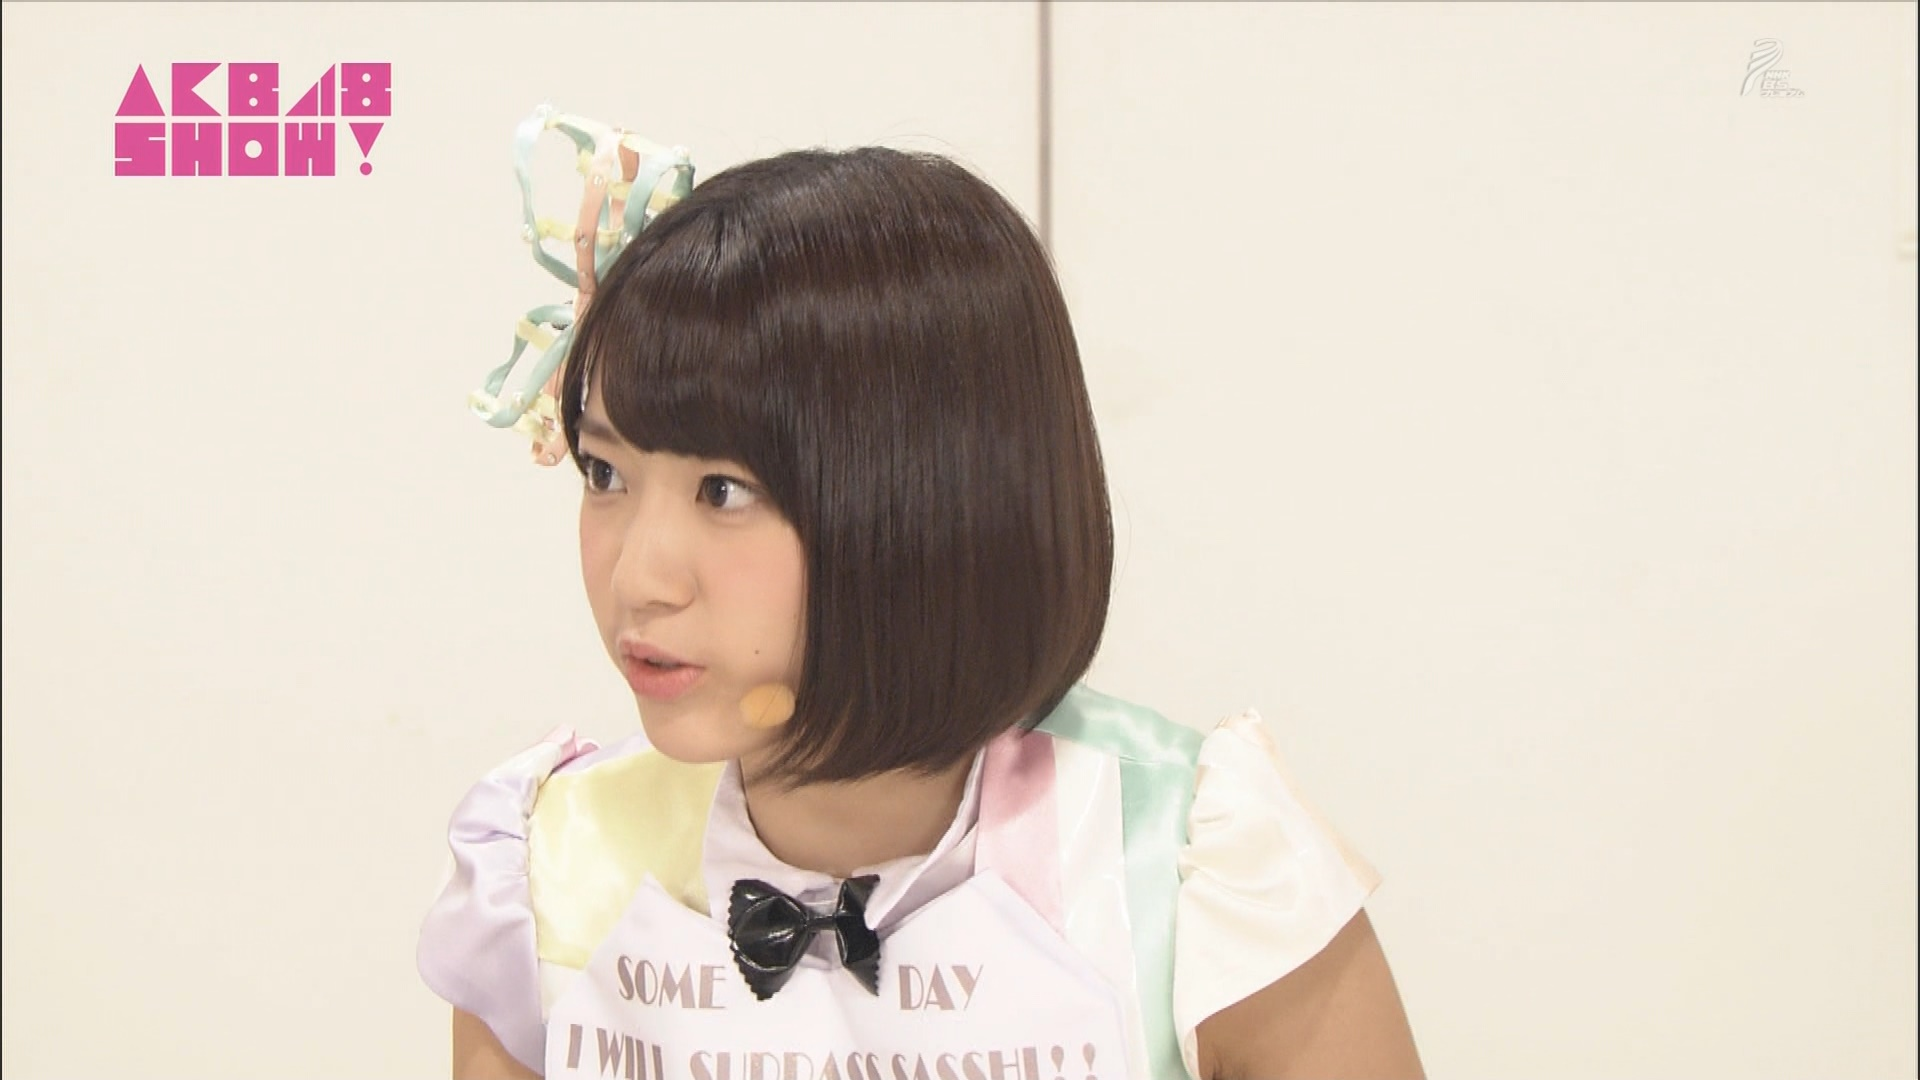 AKB48SHOW 心のプラカード 宮脇咲良 20140830 (8)